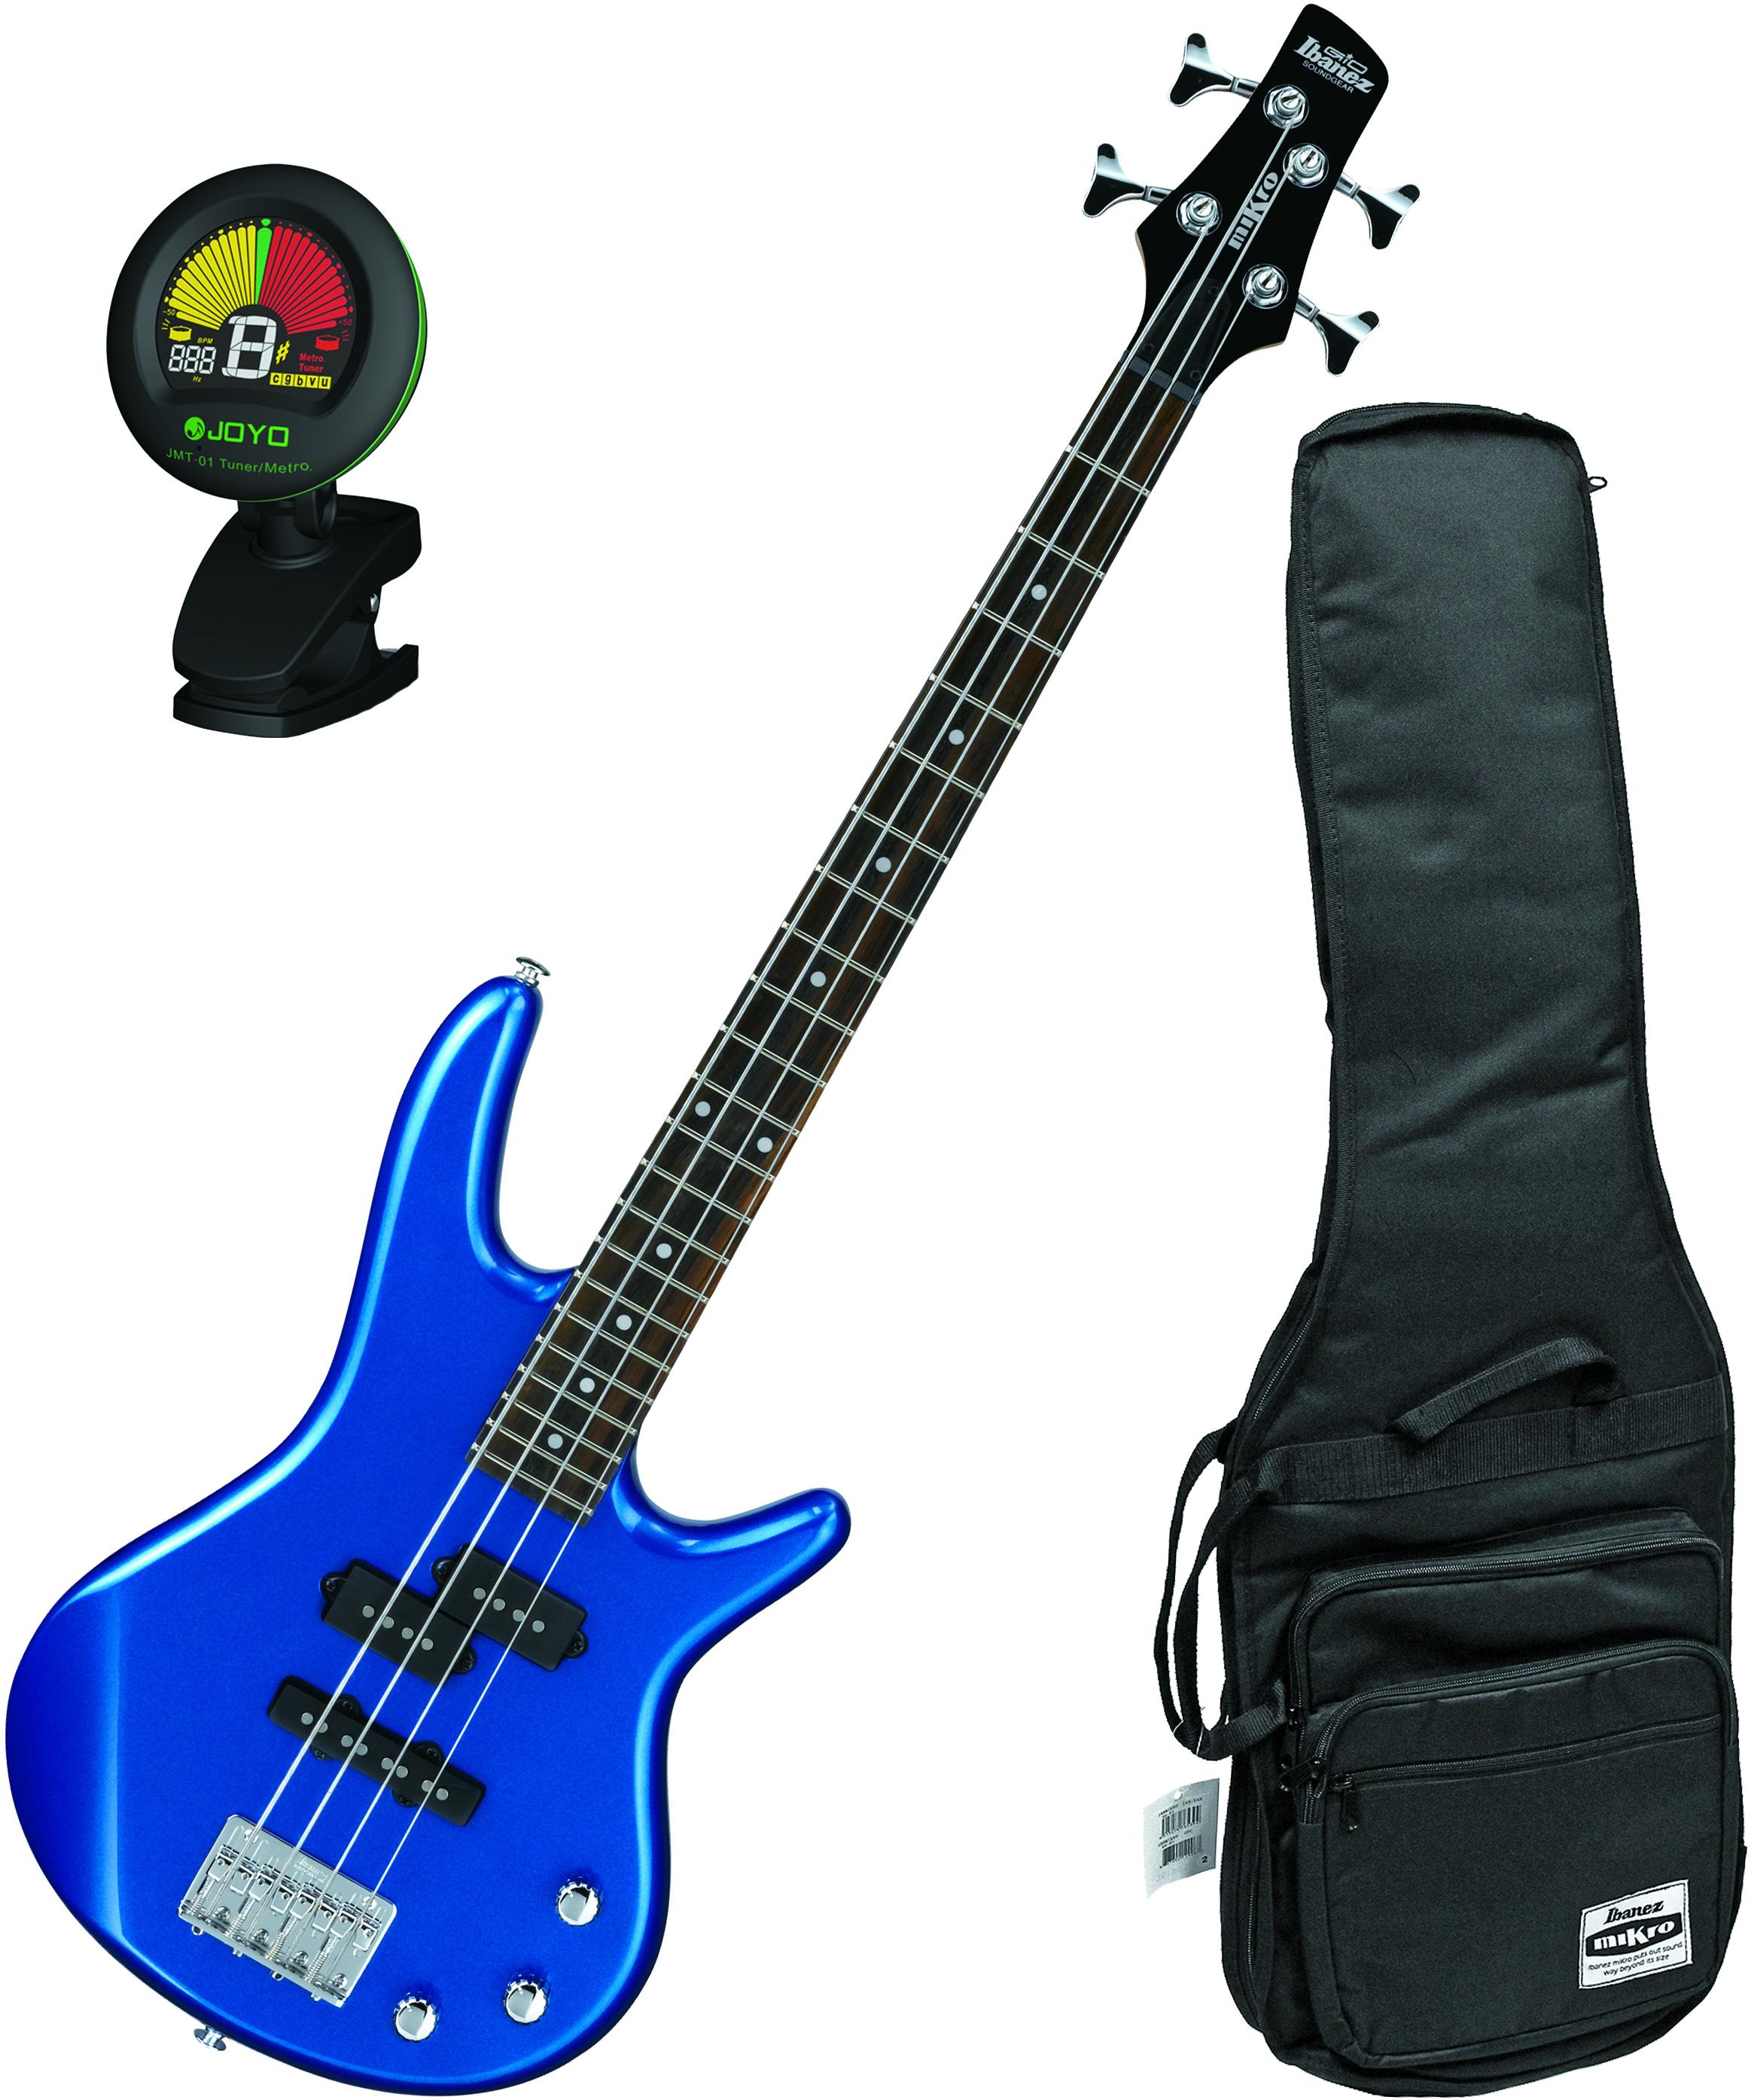 ibanez gsrm20slb starlight blue mikro 4 string bass guitar bundle w bag tun ebay. Black Bedroom Furniture Sets. Home Design Ideas